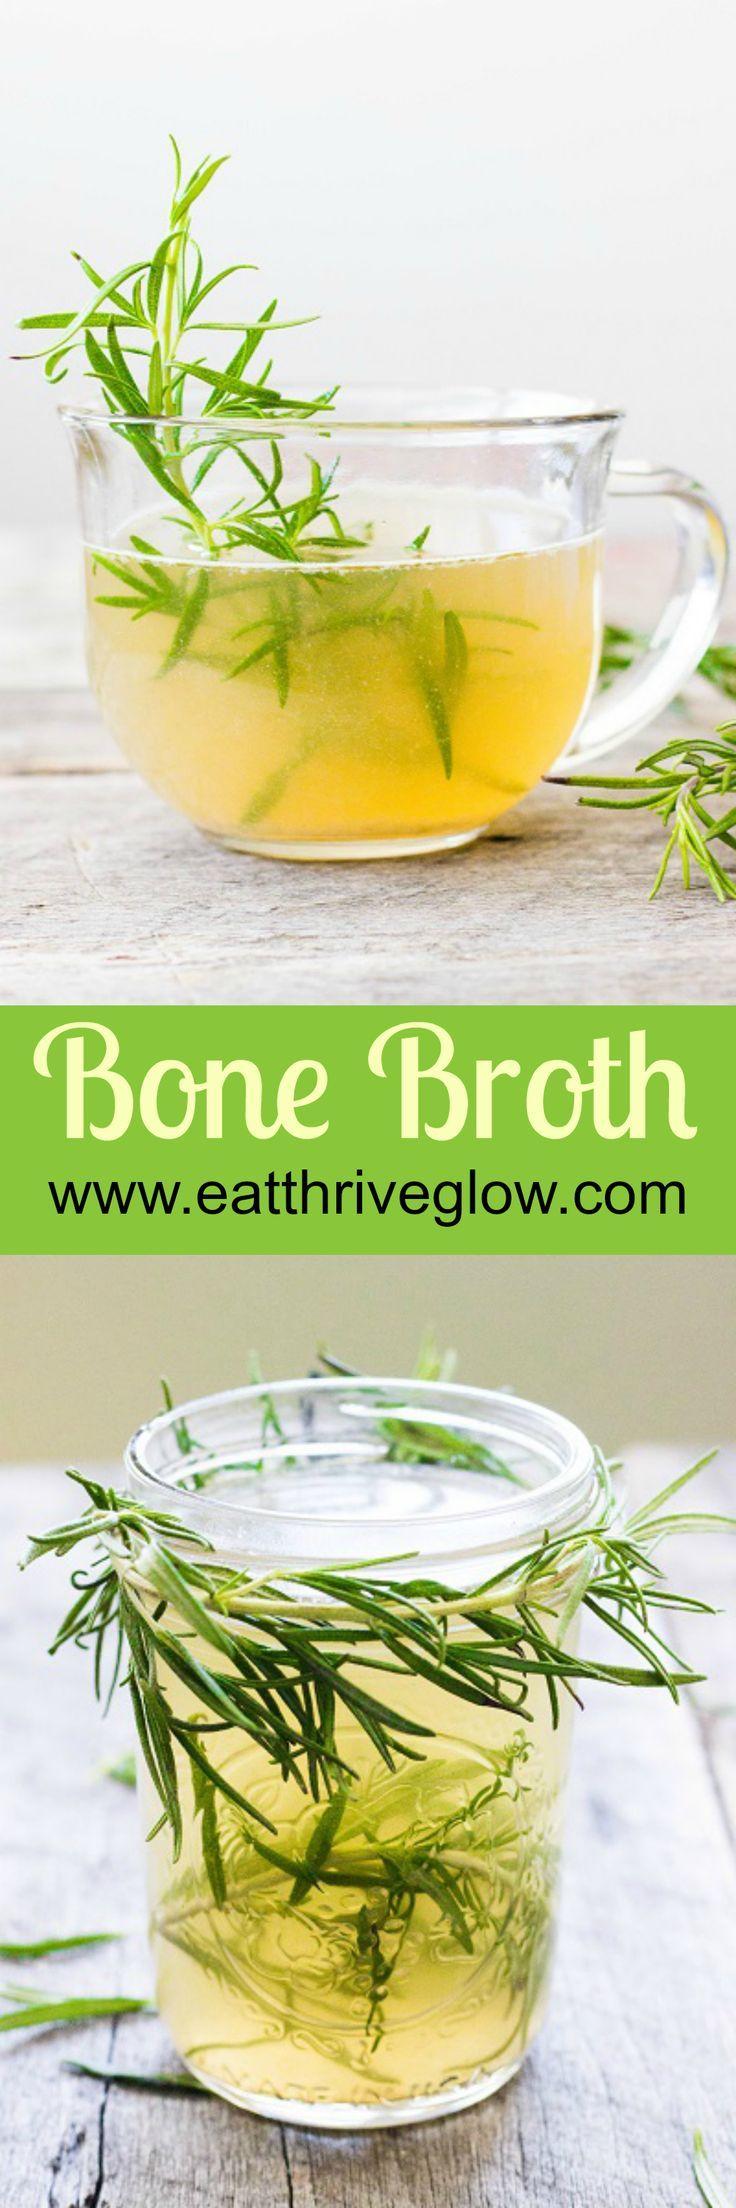 Bone Broth / Homemade Chicken Stock Recipe Bone broth